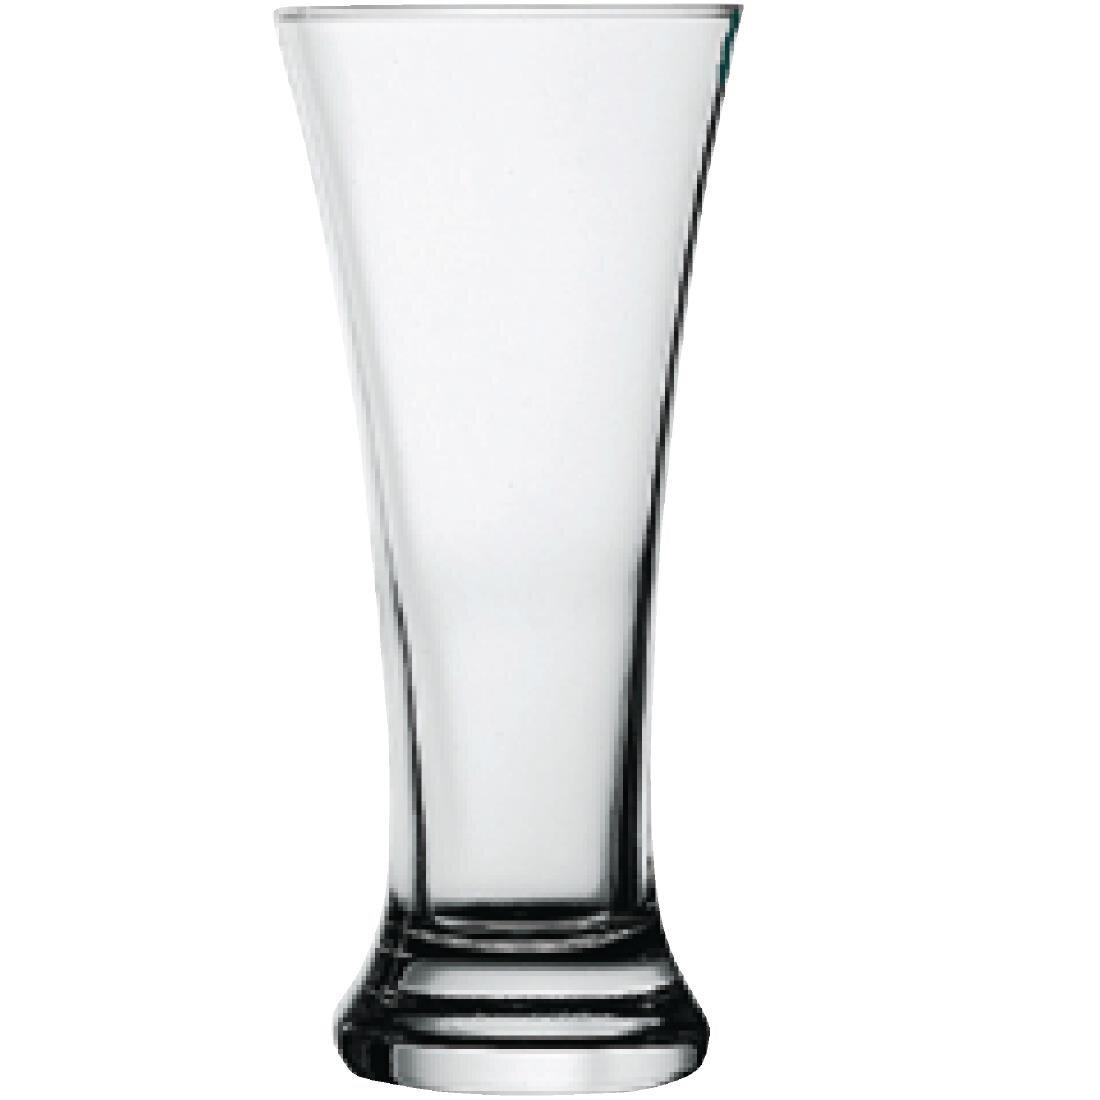 Arcoroc Pilsner Glass 10oz, (285ml). Case of 48